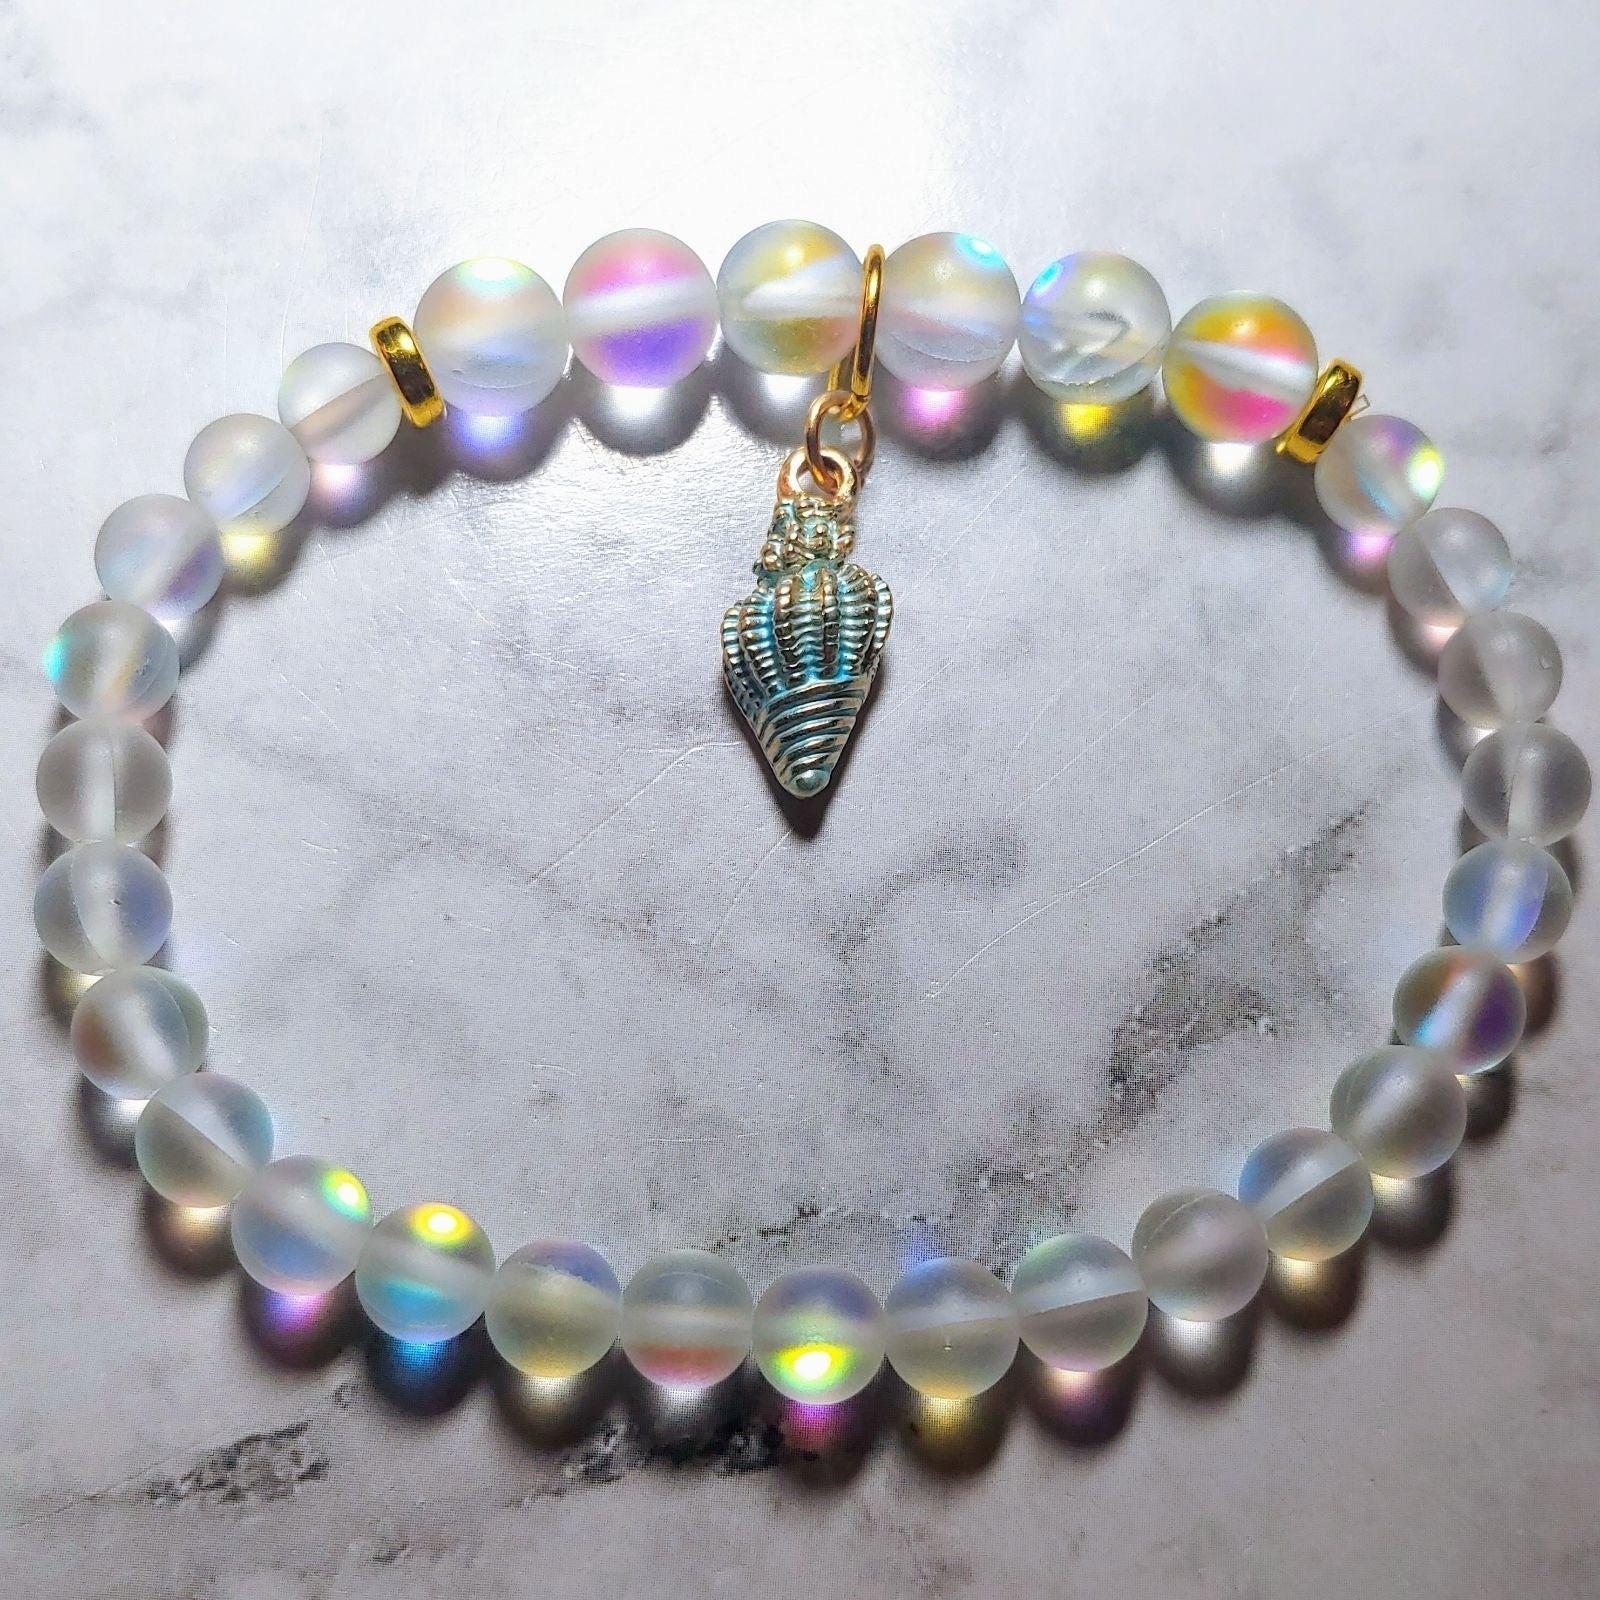 SOLD***Moonstone opal glass mermaid brac